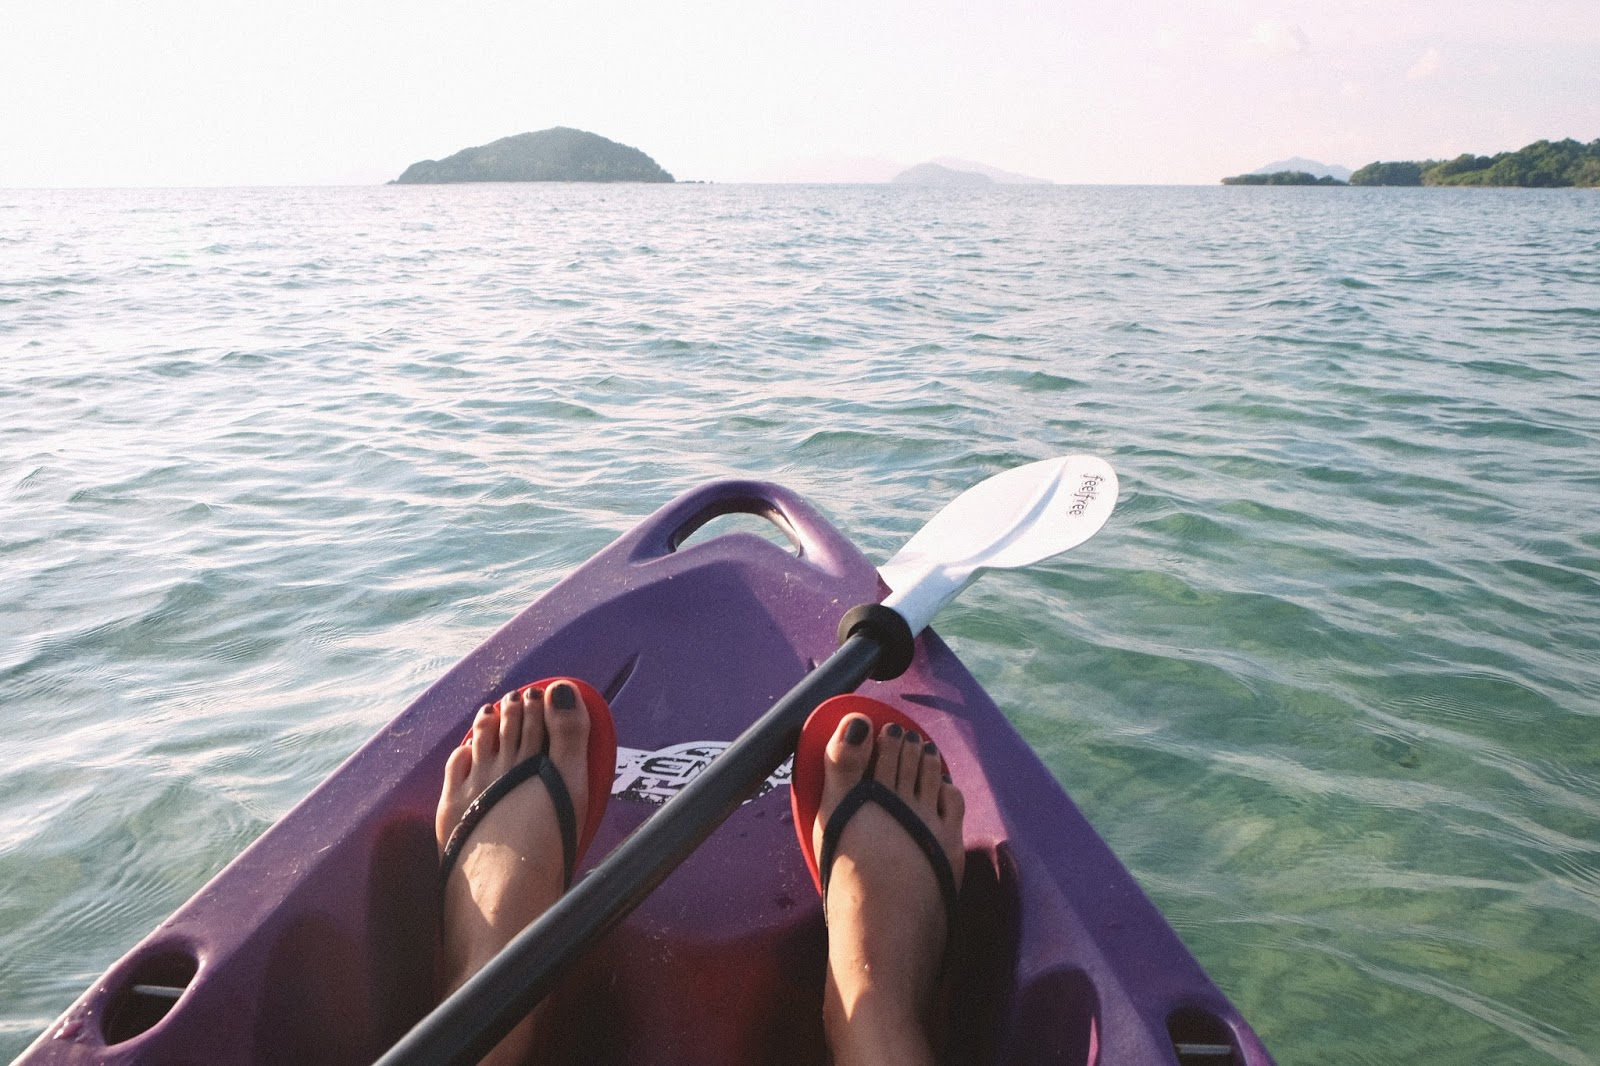 Girl in kayak - New Year's Resolutions - motherdistracted.co.uk